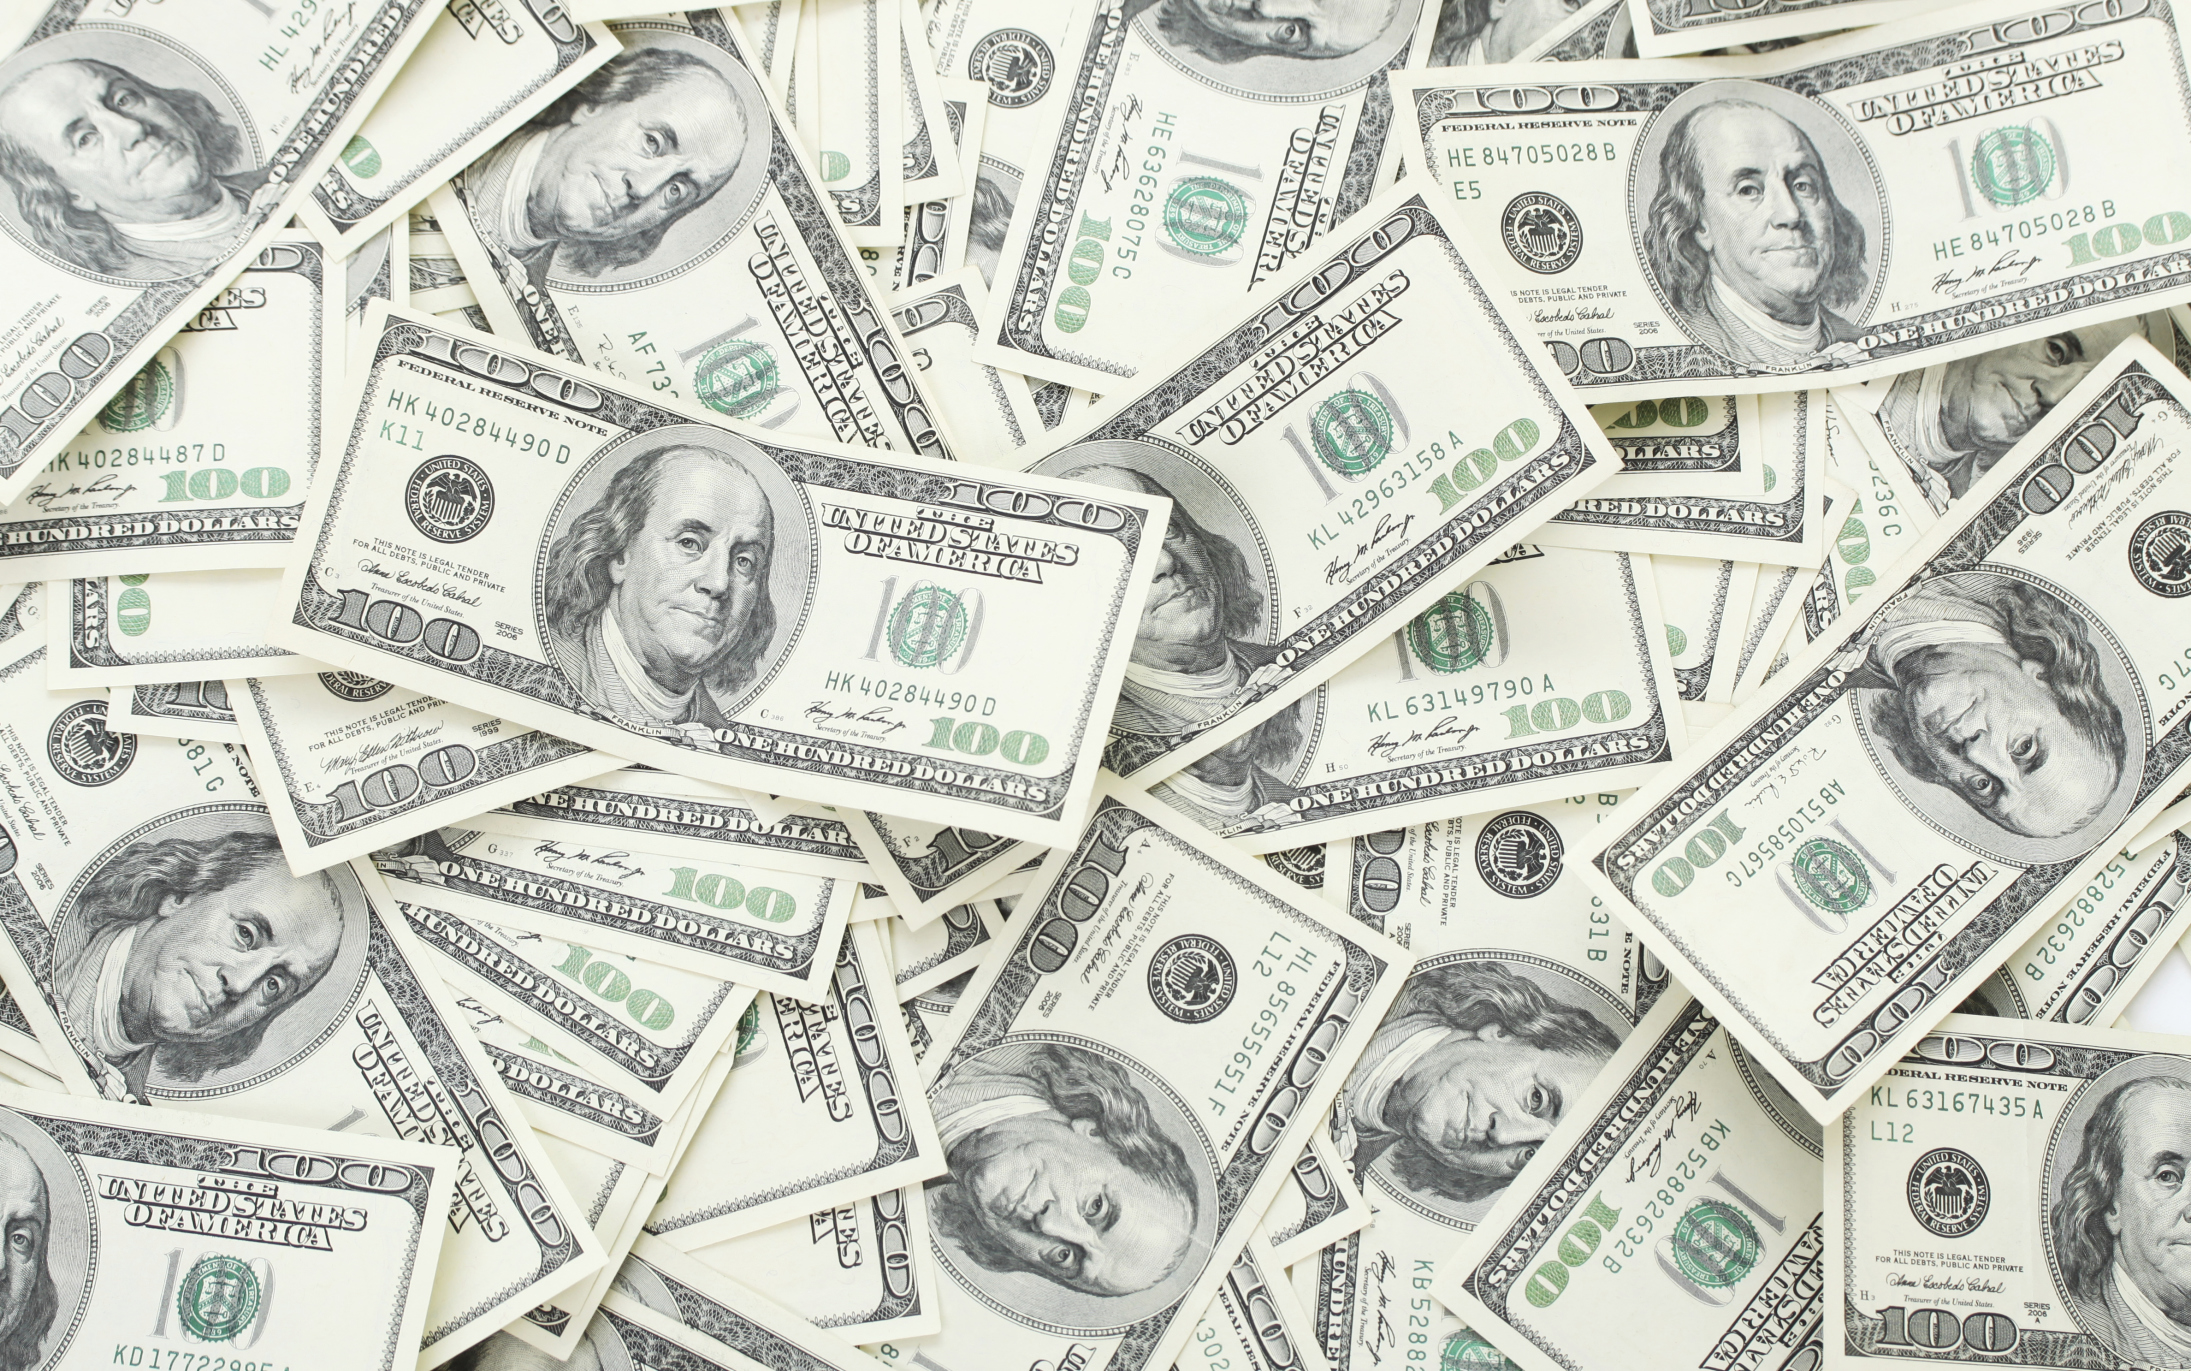 One Myth of Making Money